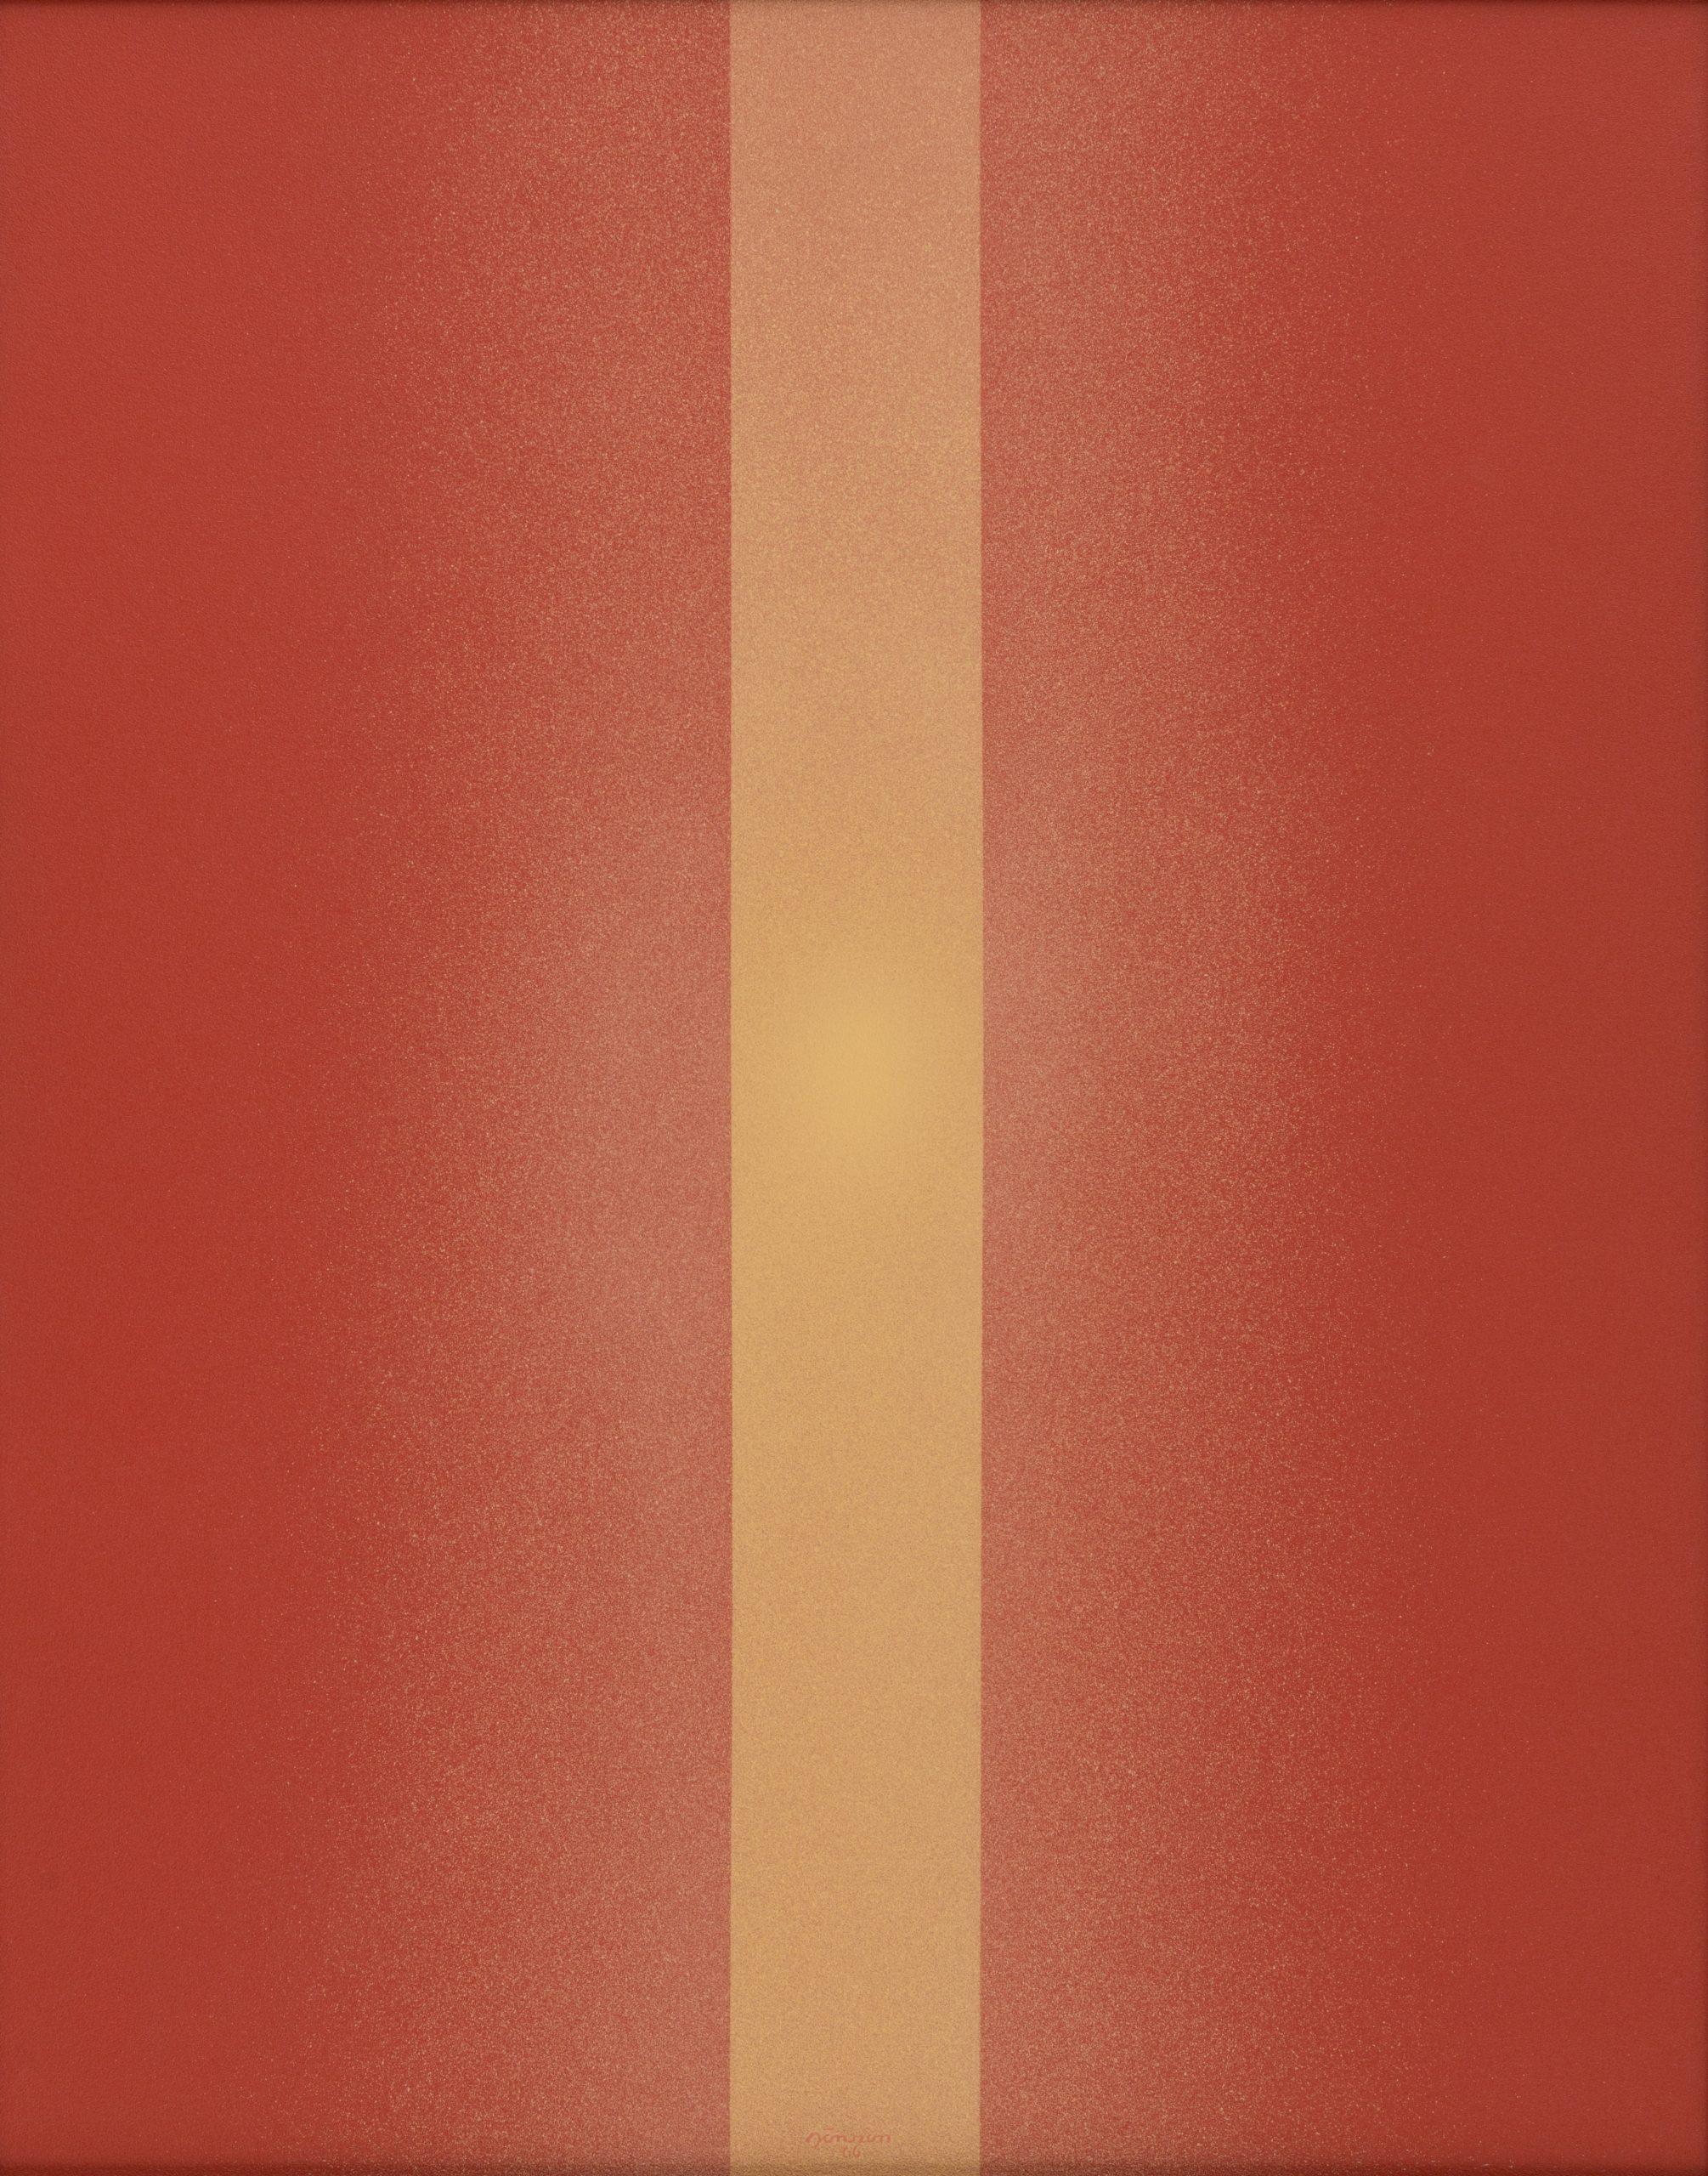 Light - A Trilogy (Polymer No. 11), 1966, Acrylic on Masonite